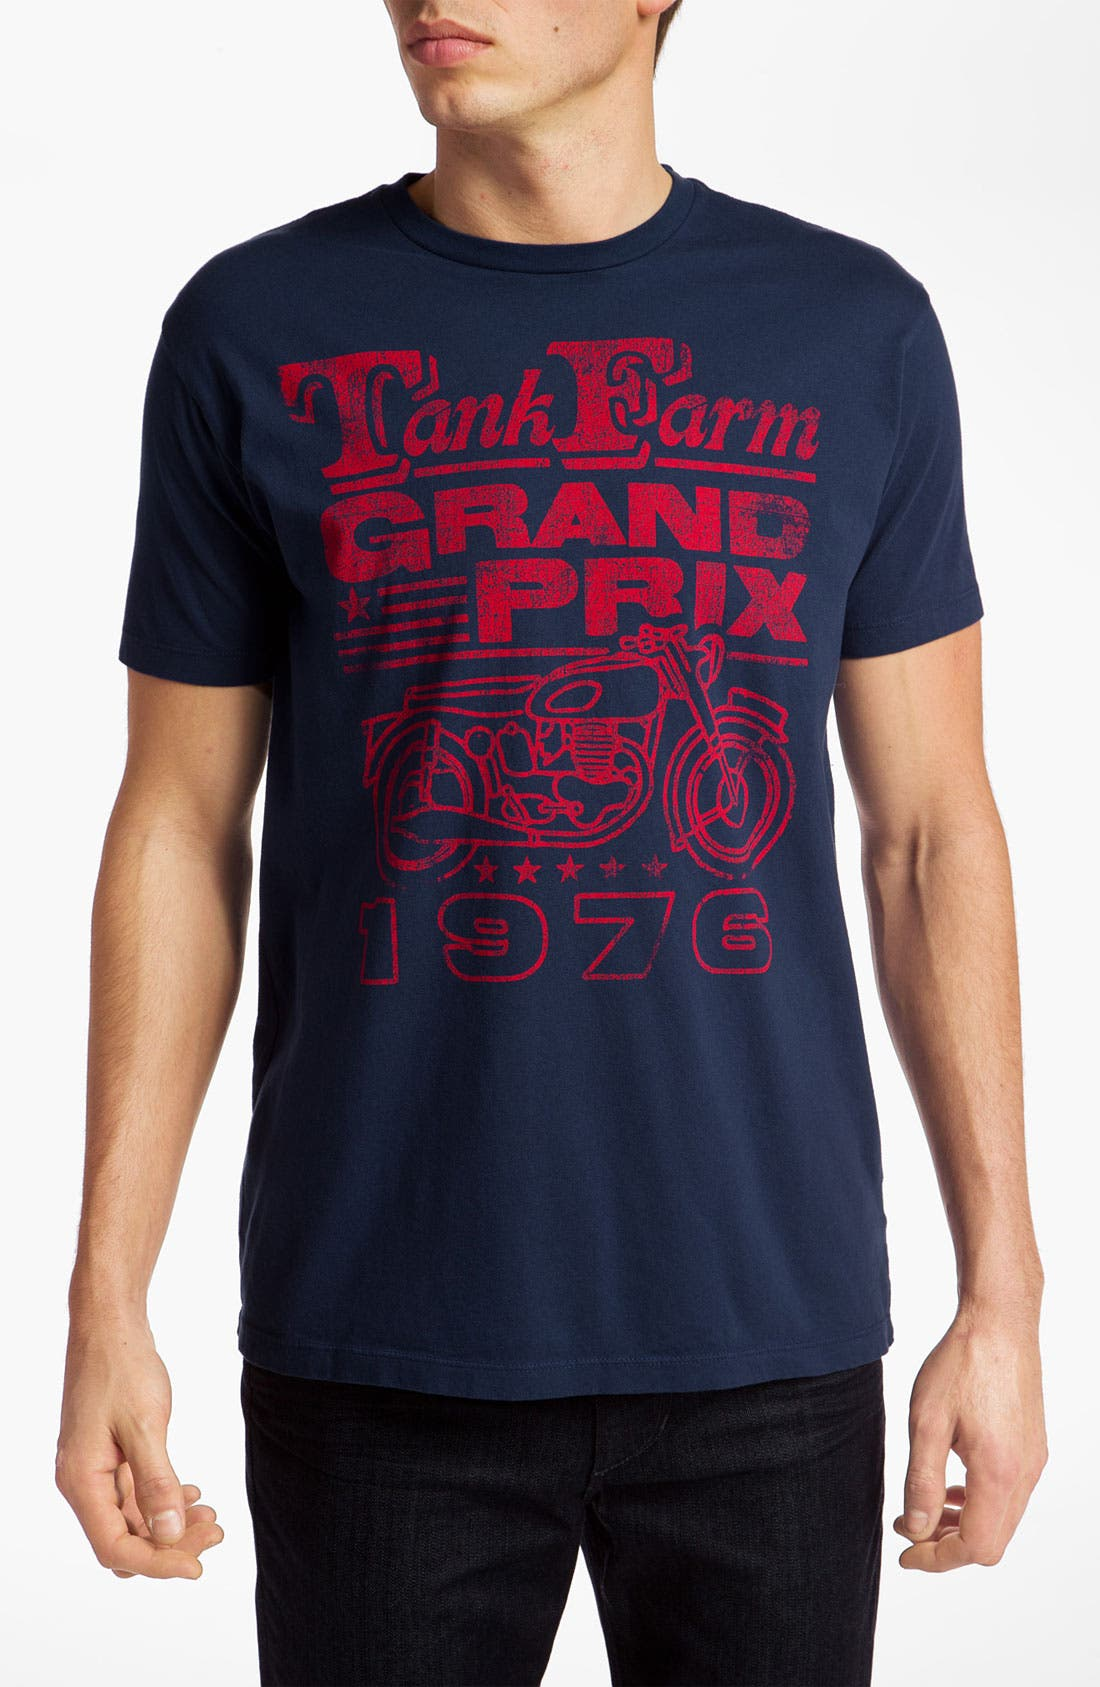 Alternate Image 1 Selected - Tankfarm 'Grand Prix' Graphic T-Shirt